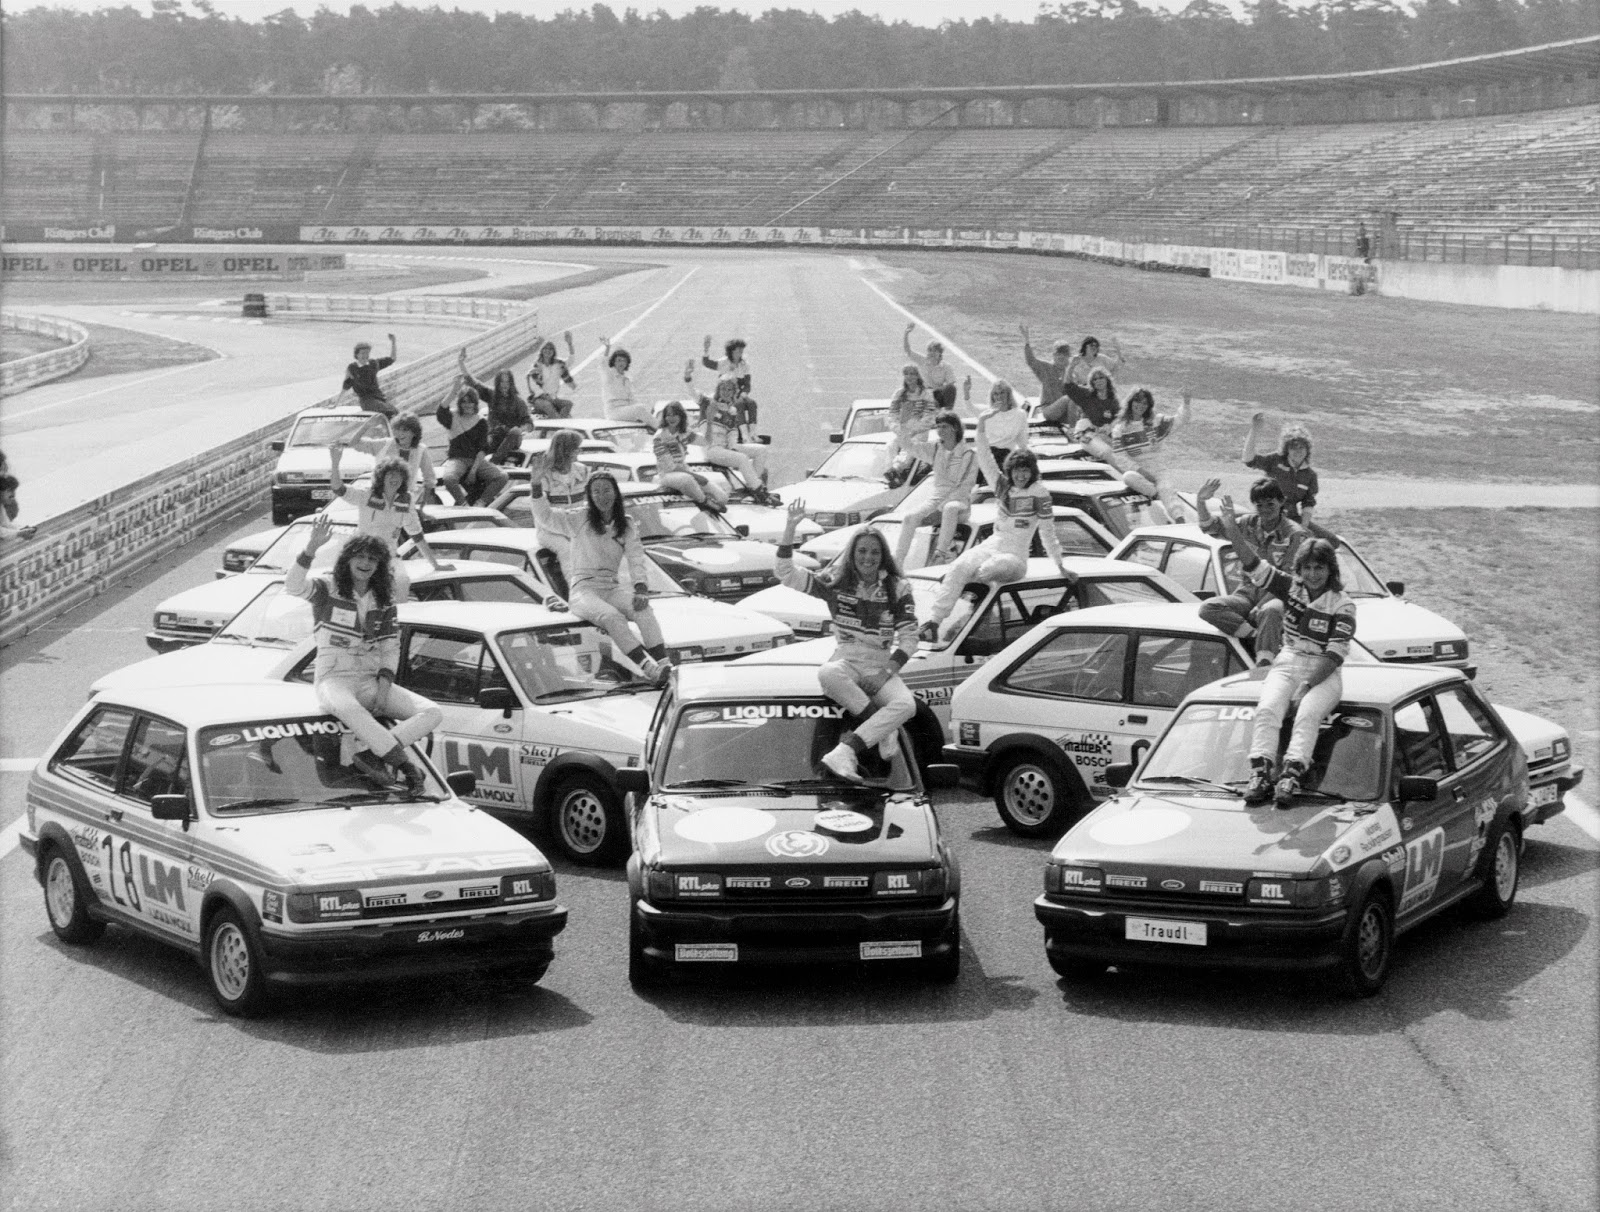 FordFiesta 1983 1989 LadiesCup 1984 01 2 Έκανες Πολύ Δρόμο Μωρό μου! - Το Ford Fiesta Γίνεται 40 Ετών Ford, Ford Fiesta, Fun, videos, zblog